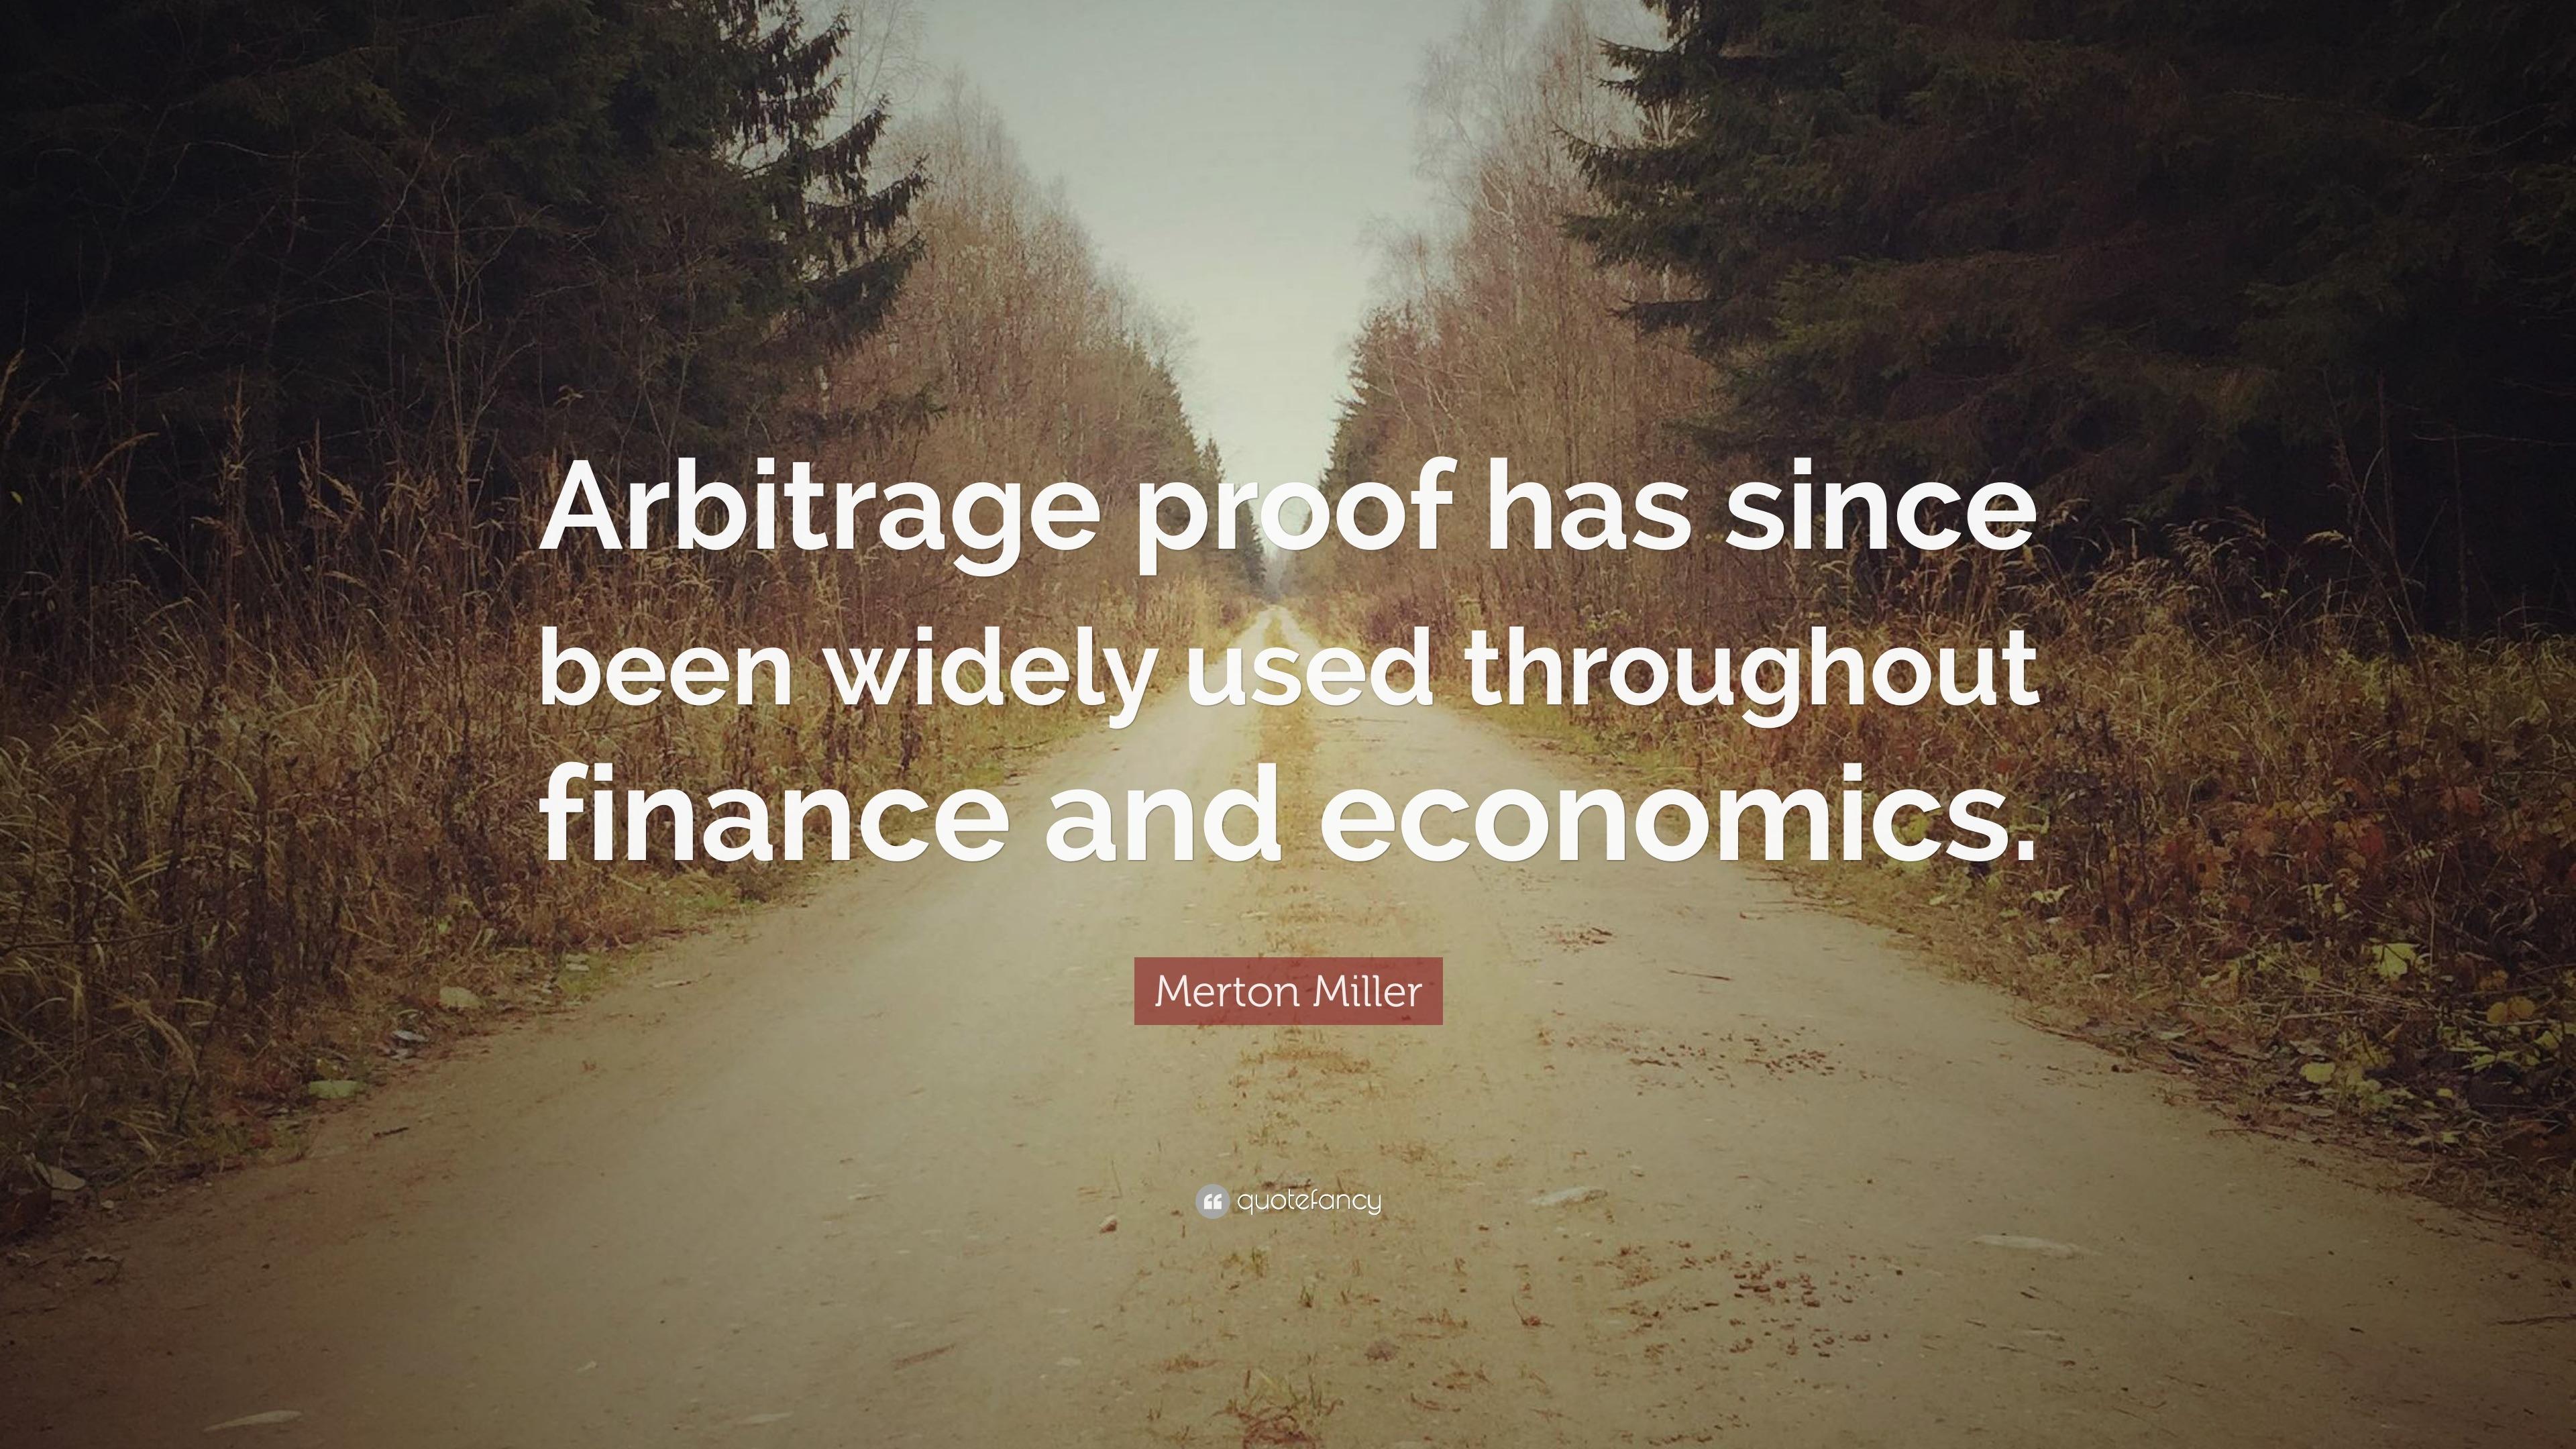 Finance Quotes Merton Miller Quotes 15 Wallpapers  Quotefancy